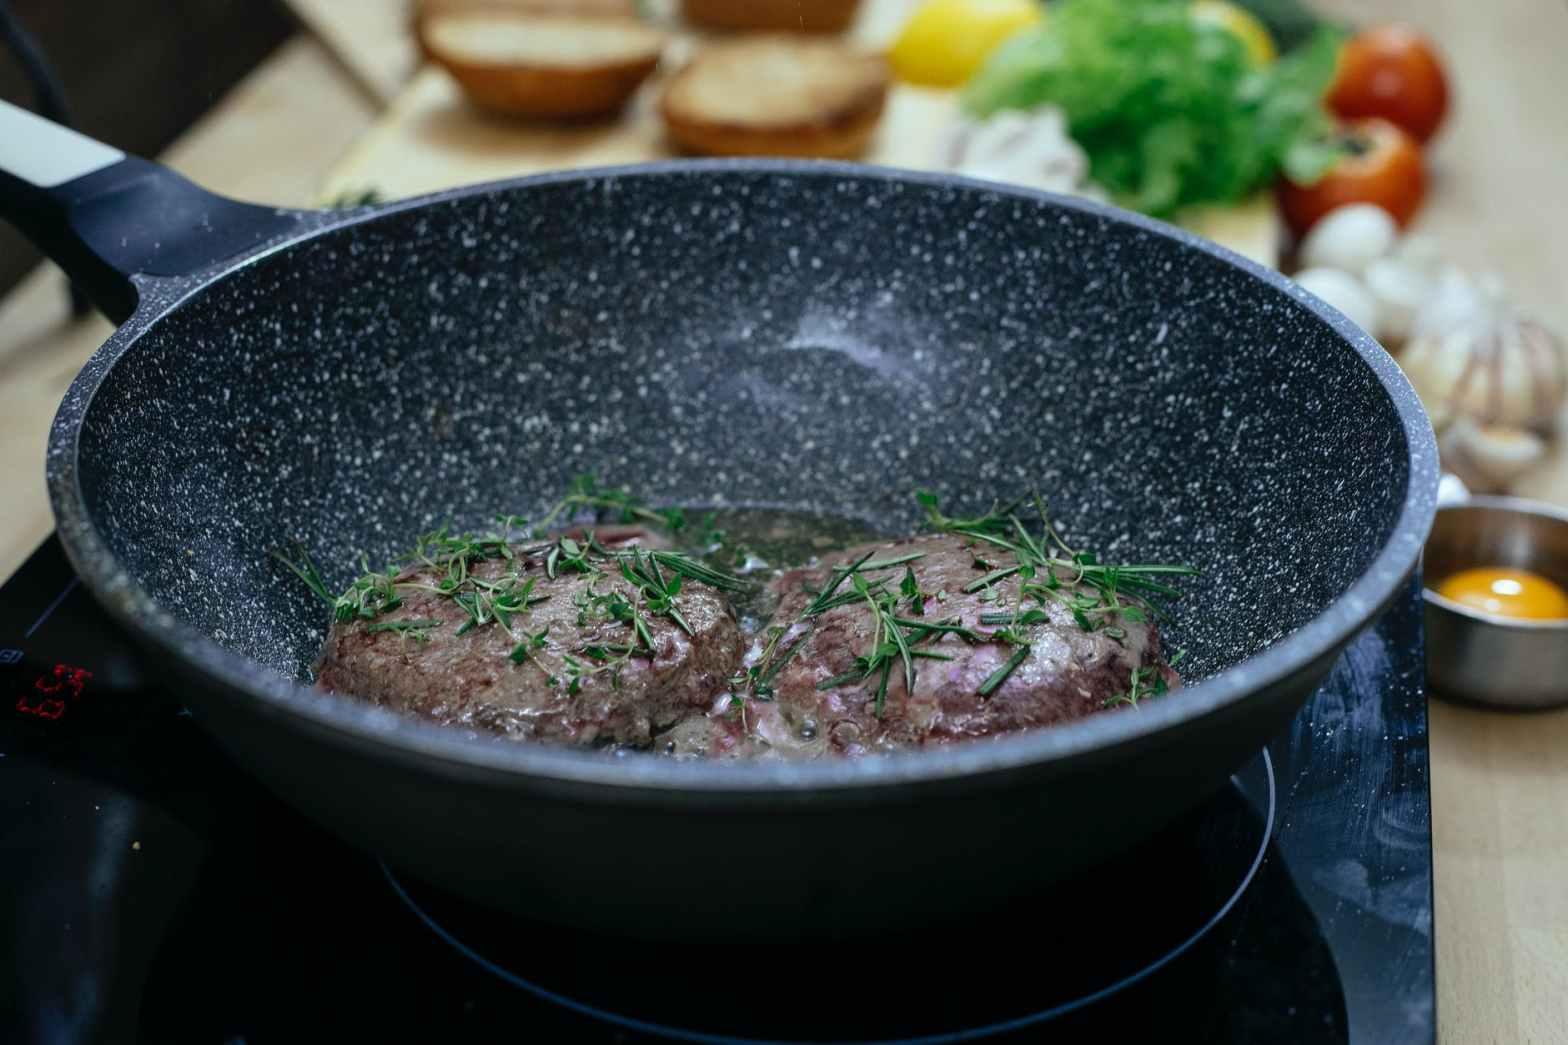 Bifteki / grekiska pannbiffar i stekpanna - läckra grekiska färsbiffar